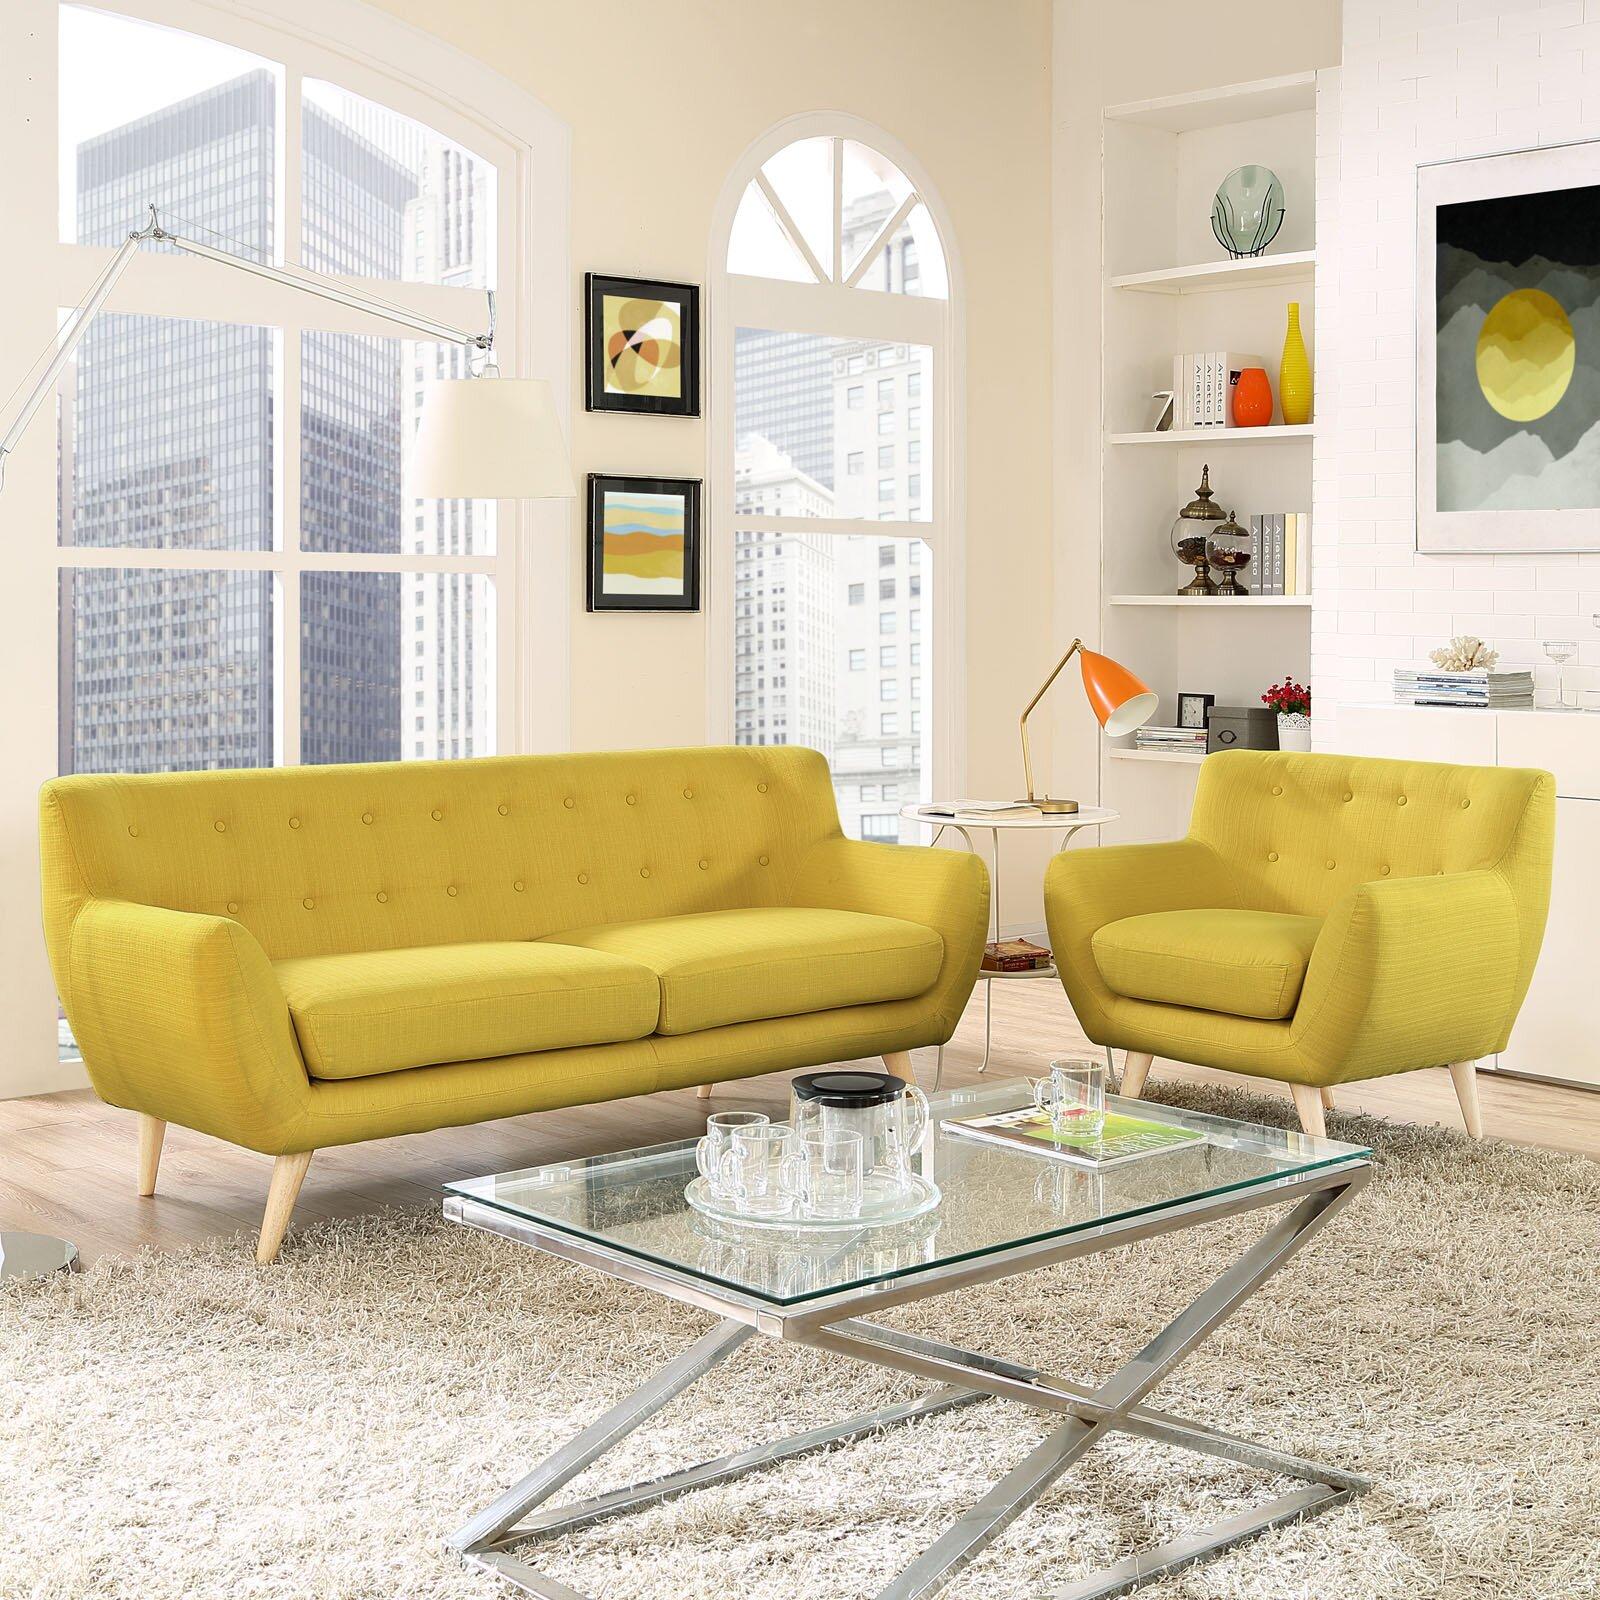 Modway remark 2 piece living room set reviews wayfair for 2 piece living room set